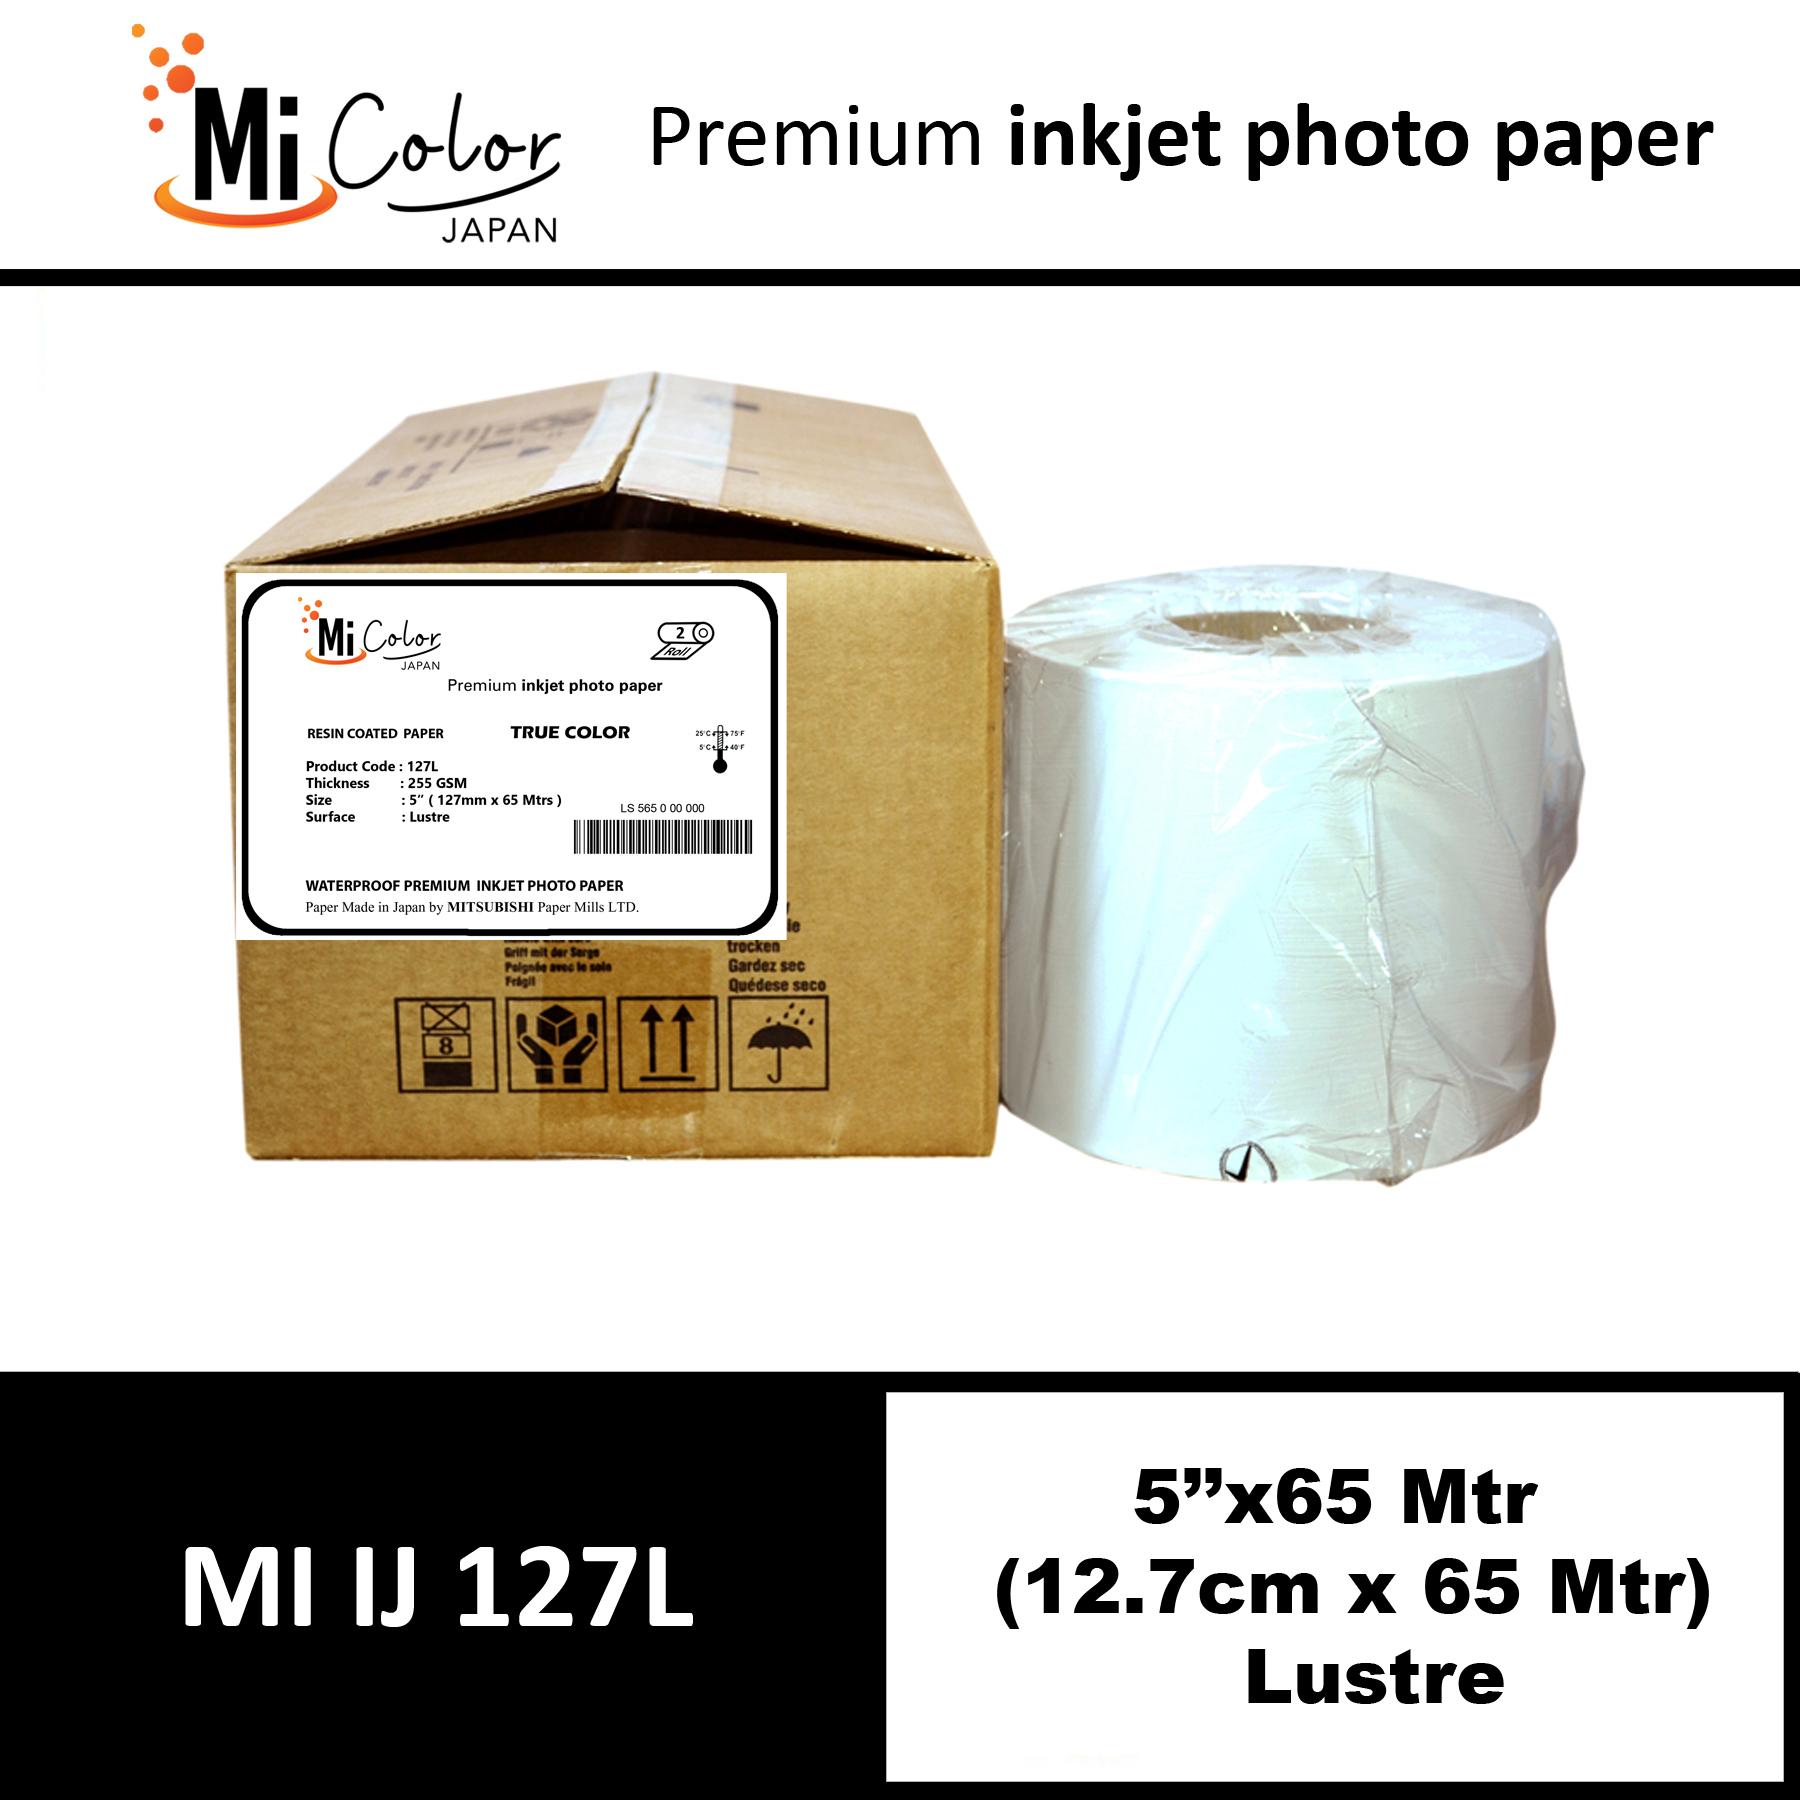 "Mi Color Inkjet RC Paper 5"" x 65 Mtrs Lustre"